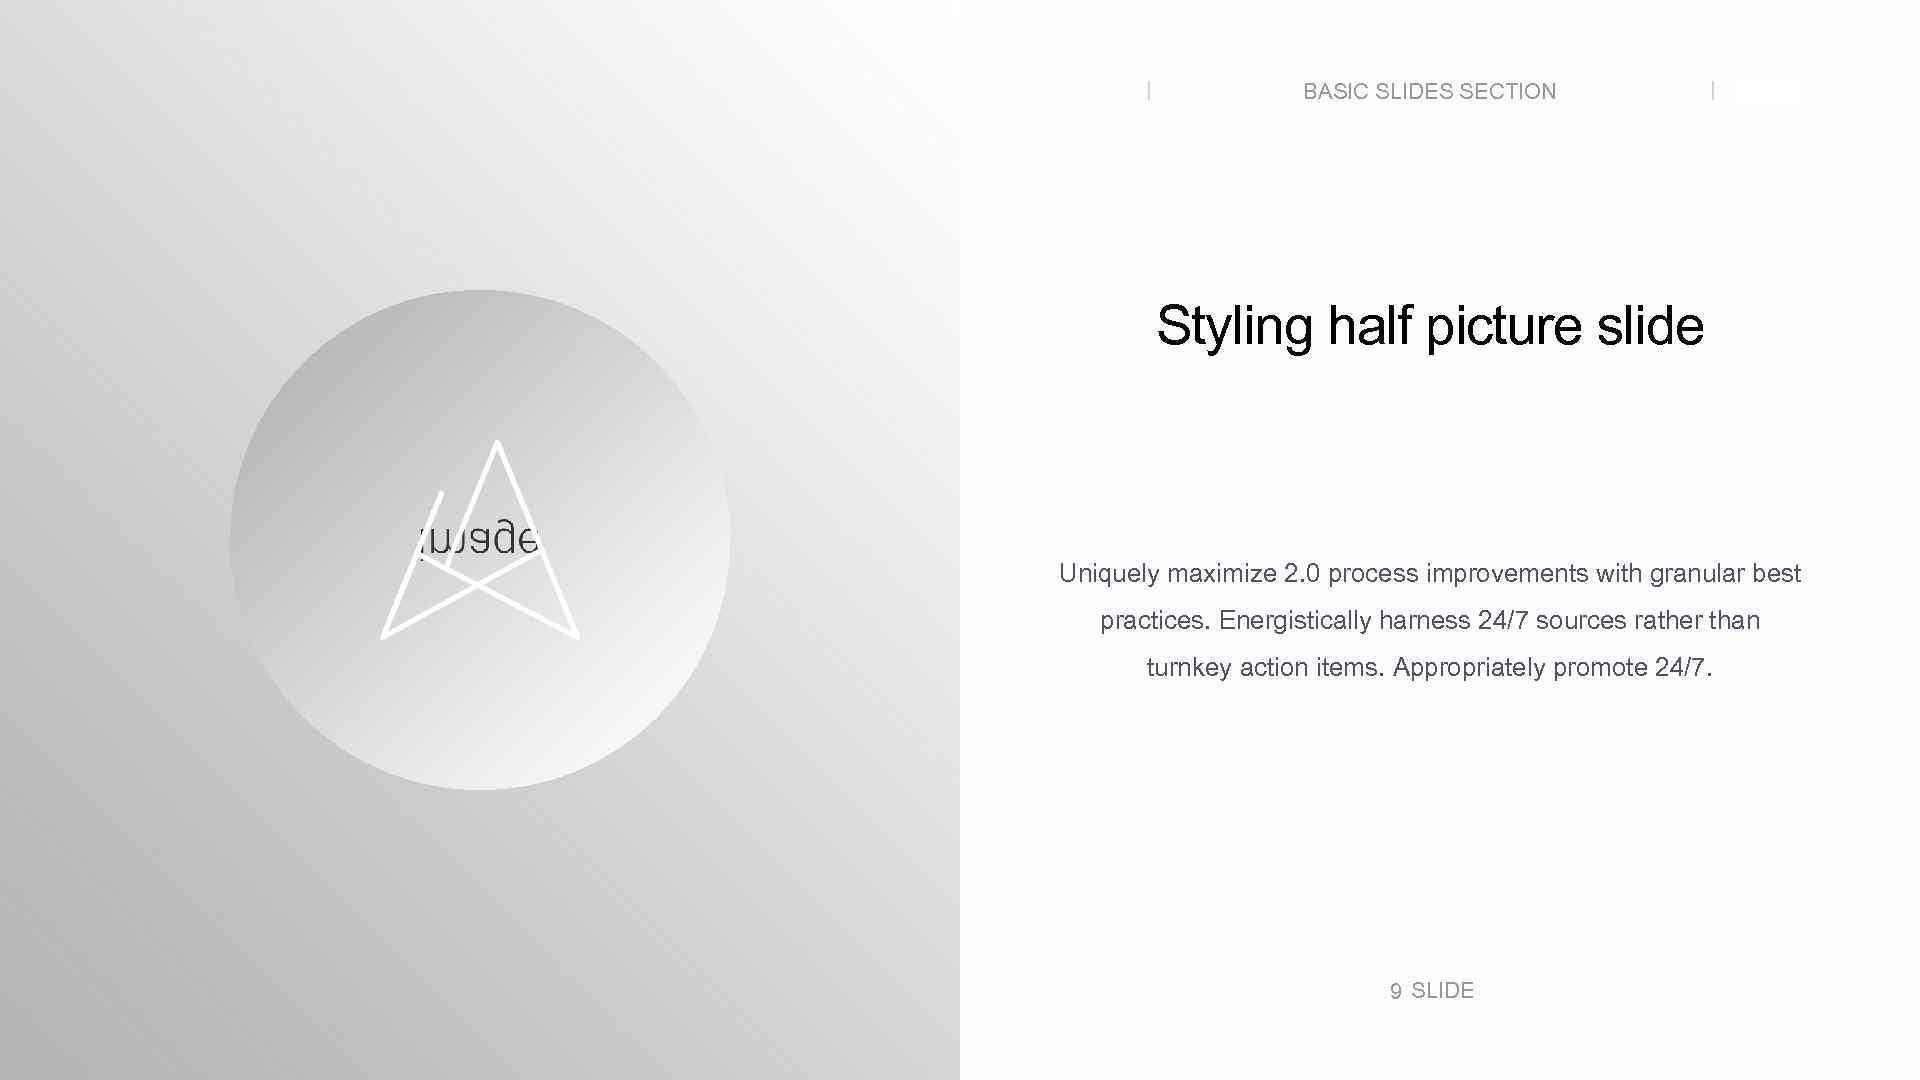 BASIC SLIDES SECTION SLIDE Styling half picture slide Uniquely maximize 2. 0 process improvements